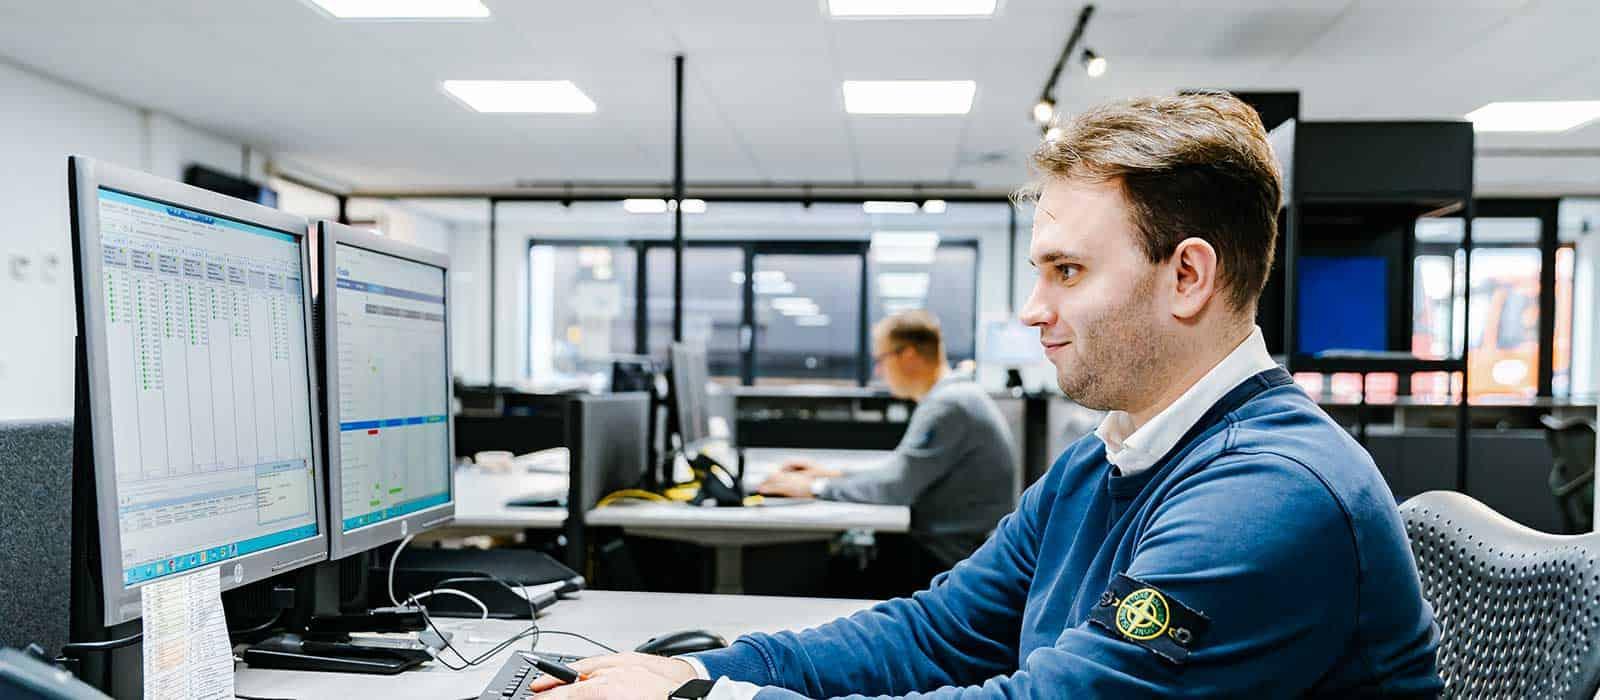 brantjes-data-vernietiging-klantenservice-header